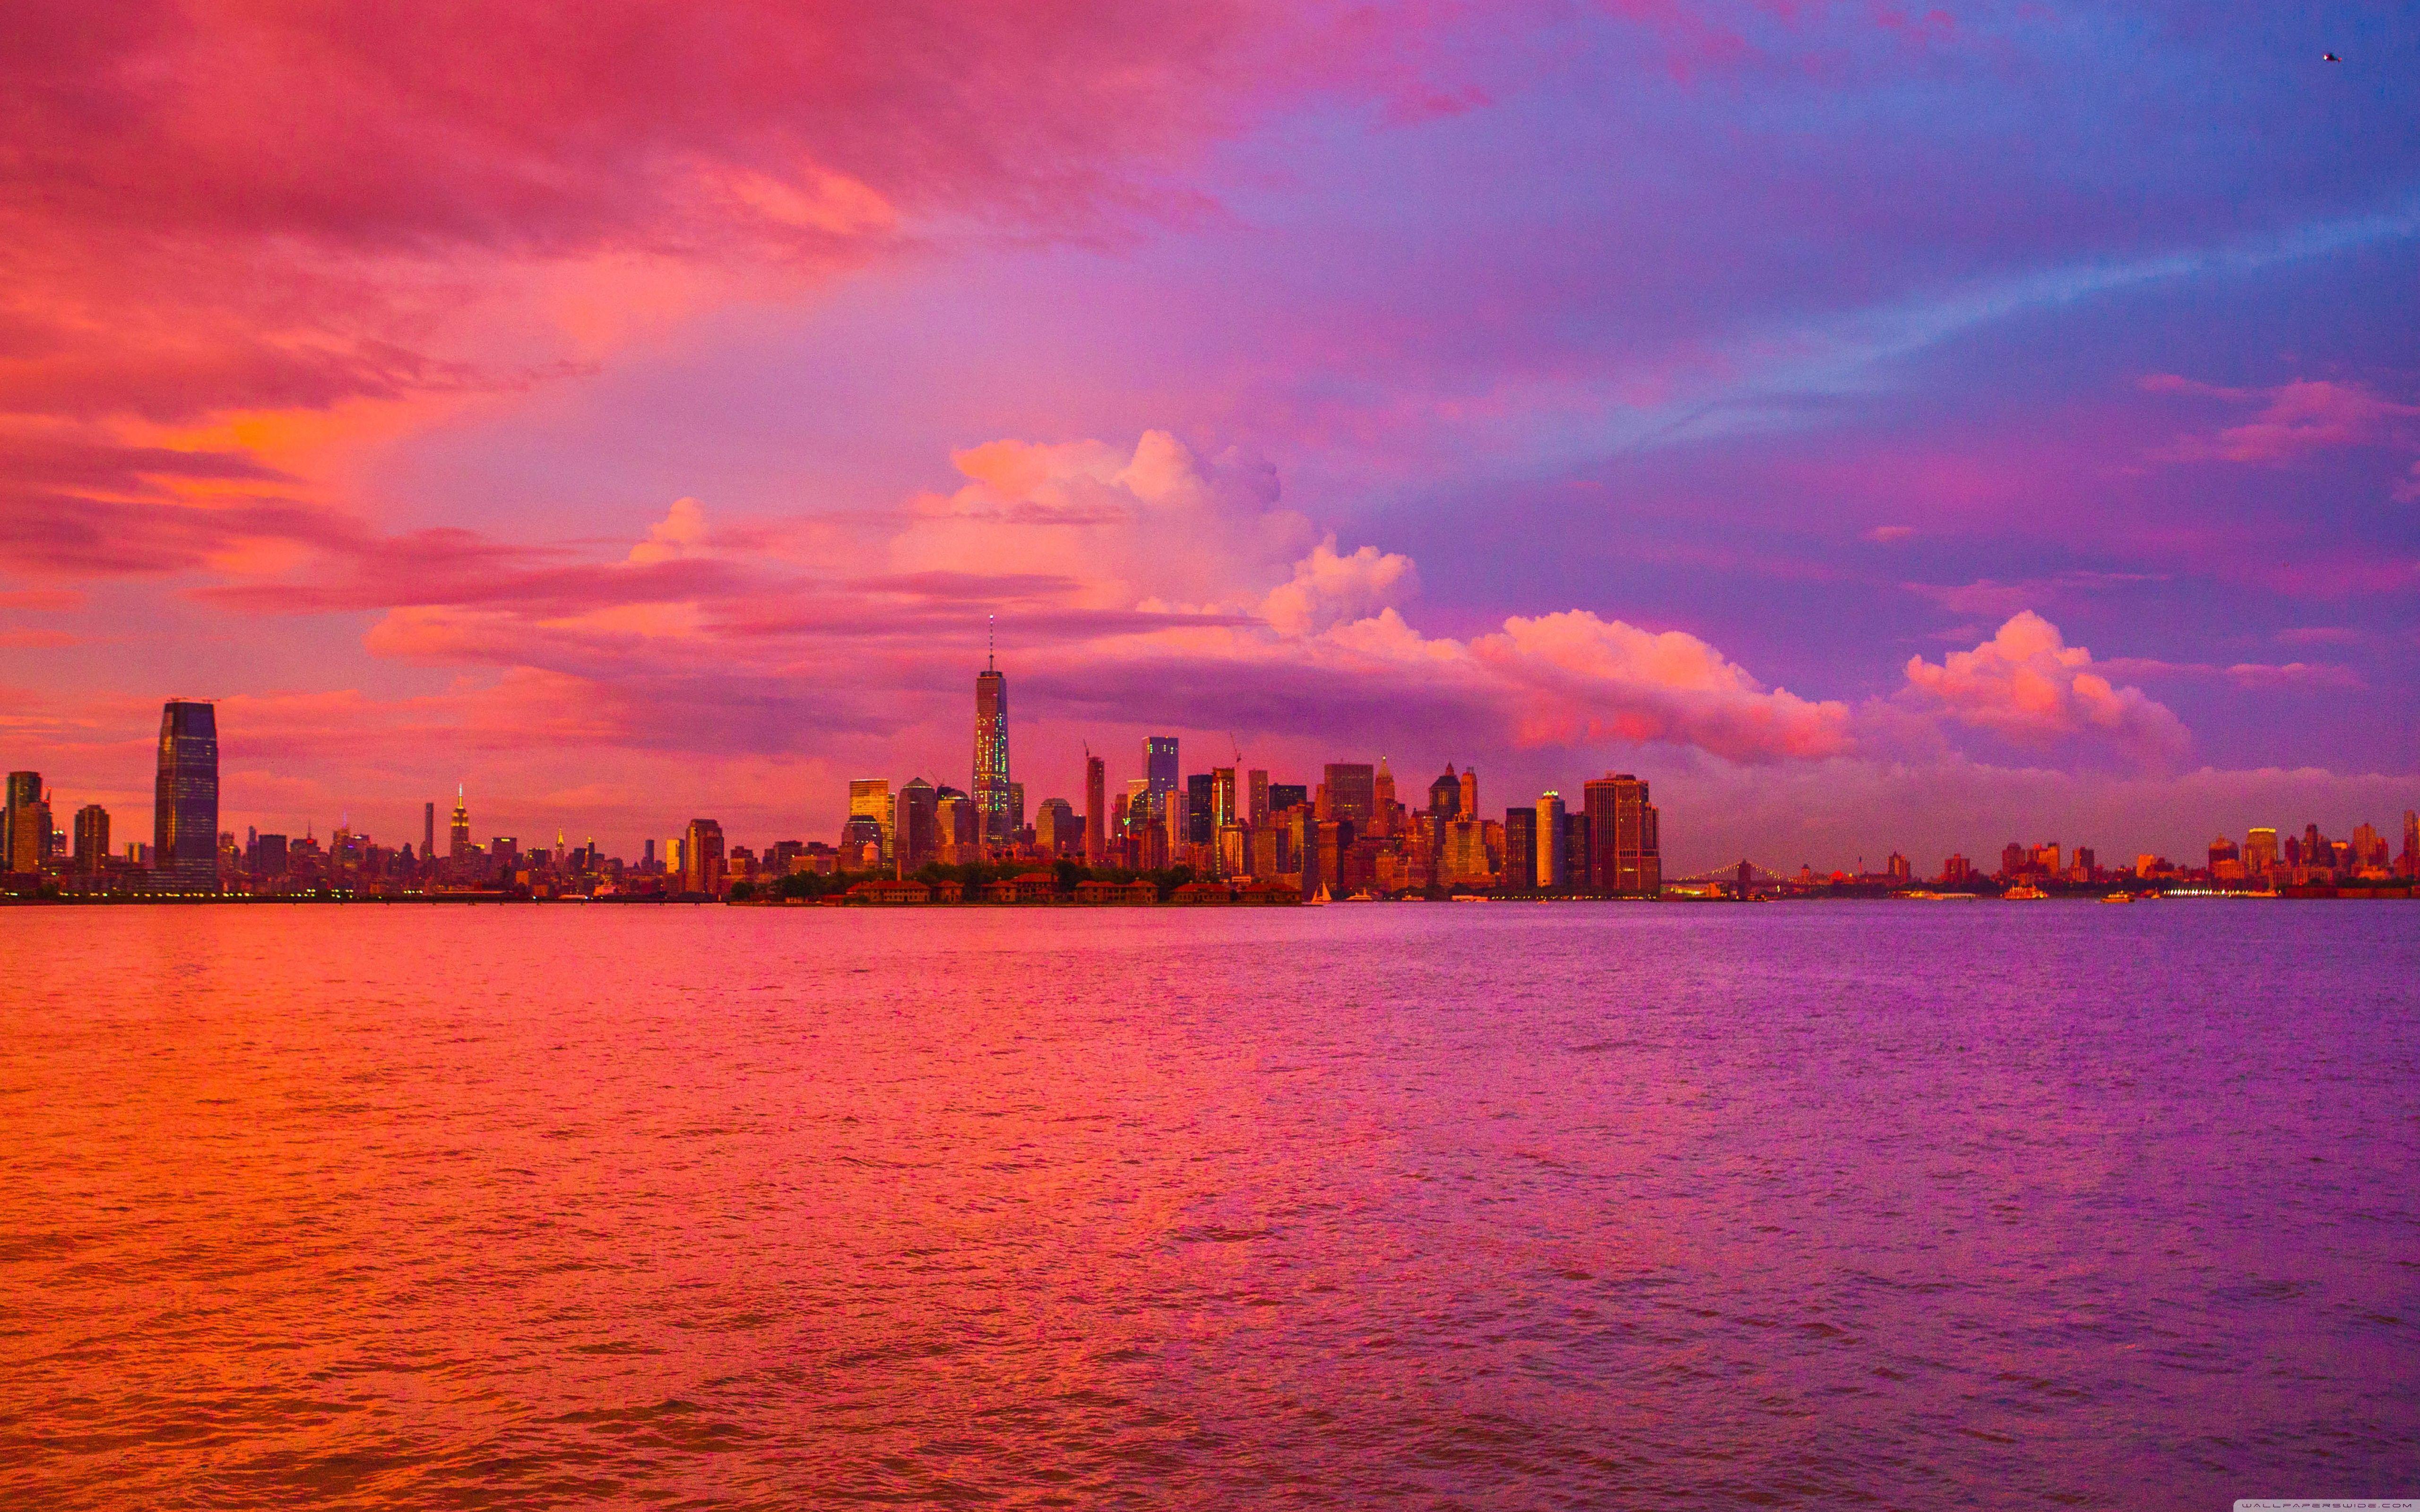 New York City Skyline Wallpapers - Wallpaper Cave